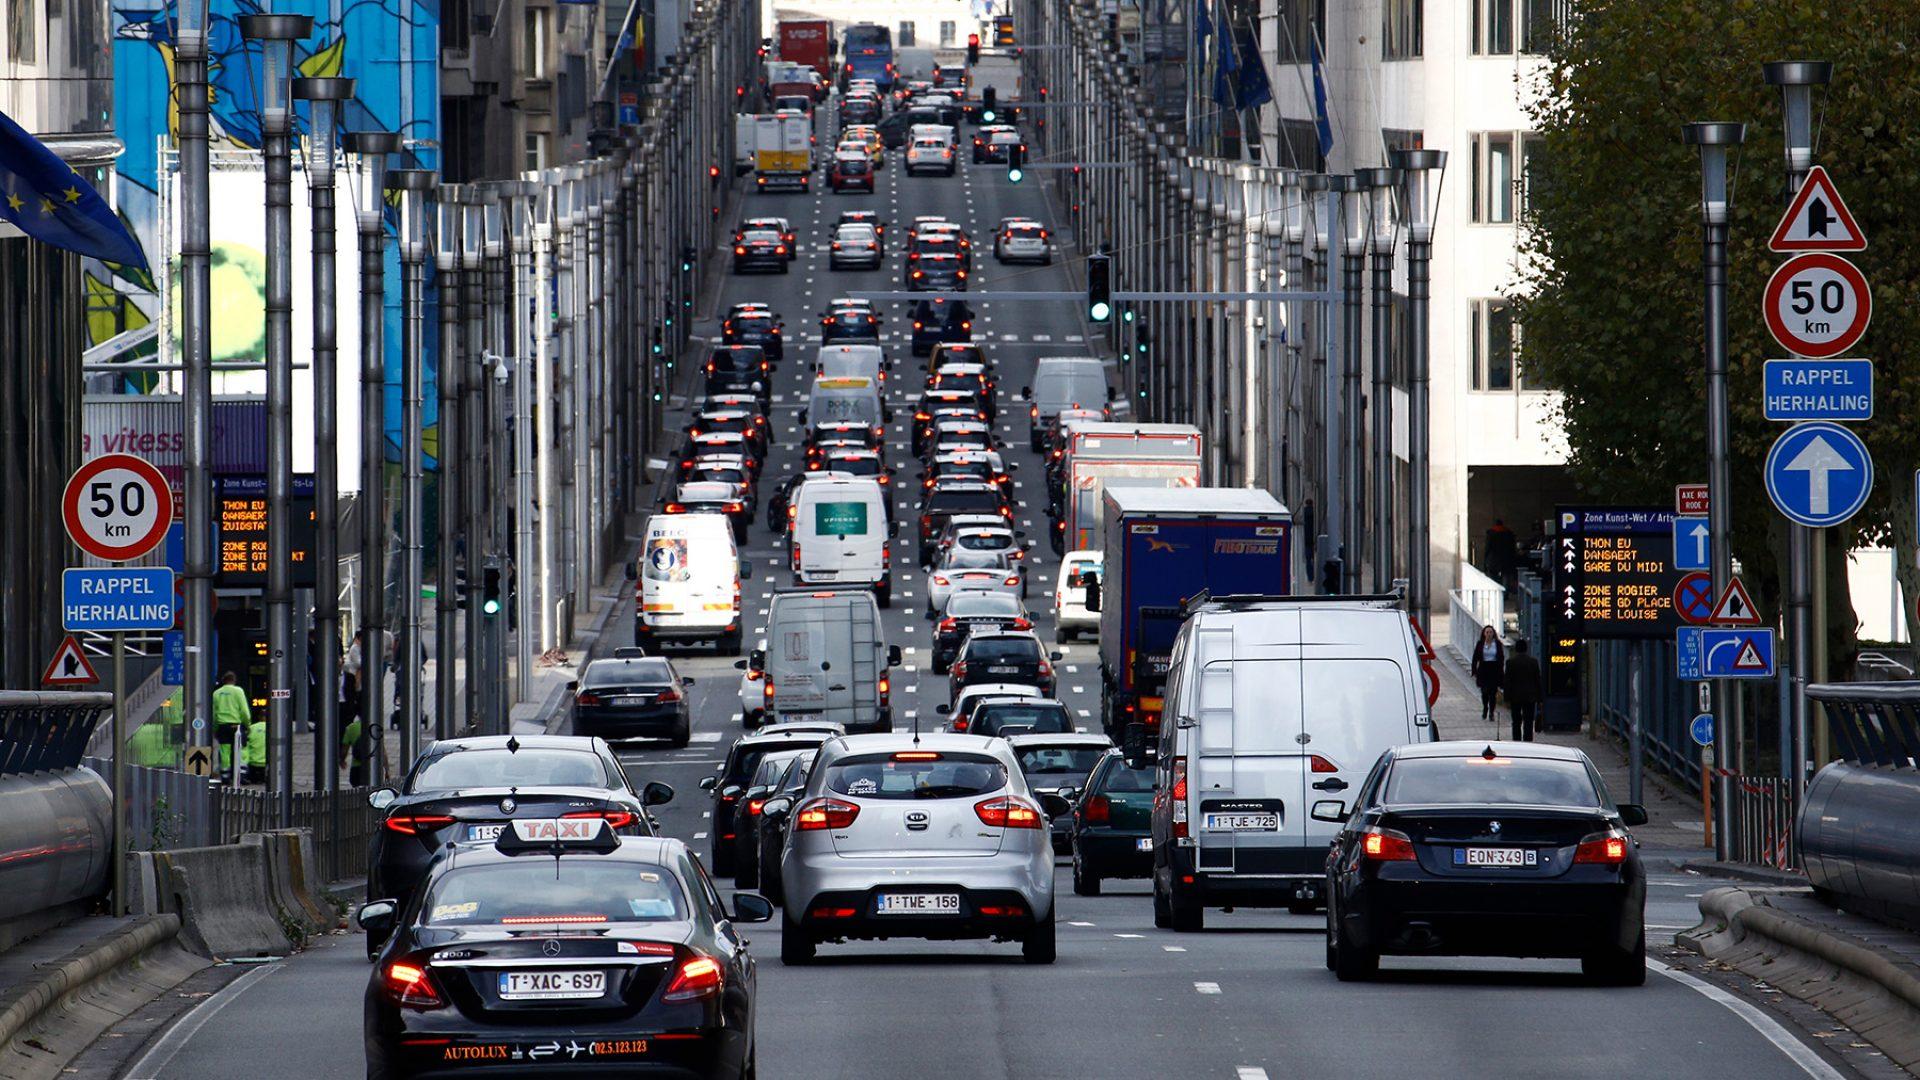 Driving in Belgium